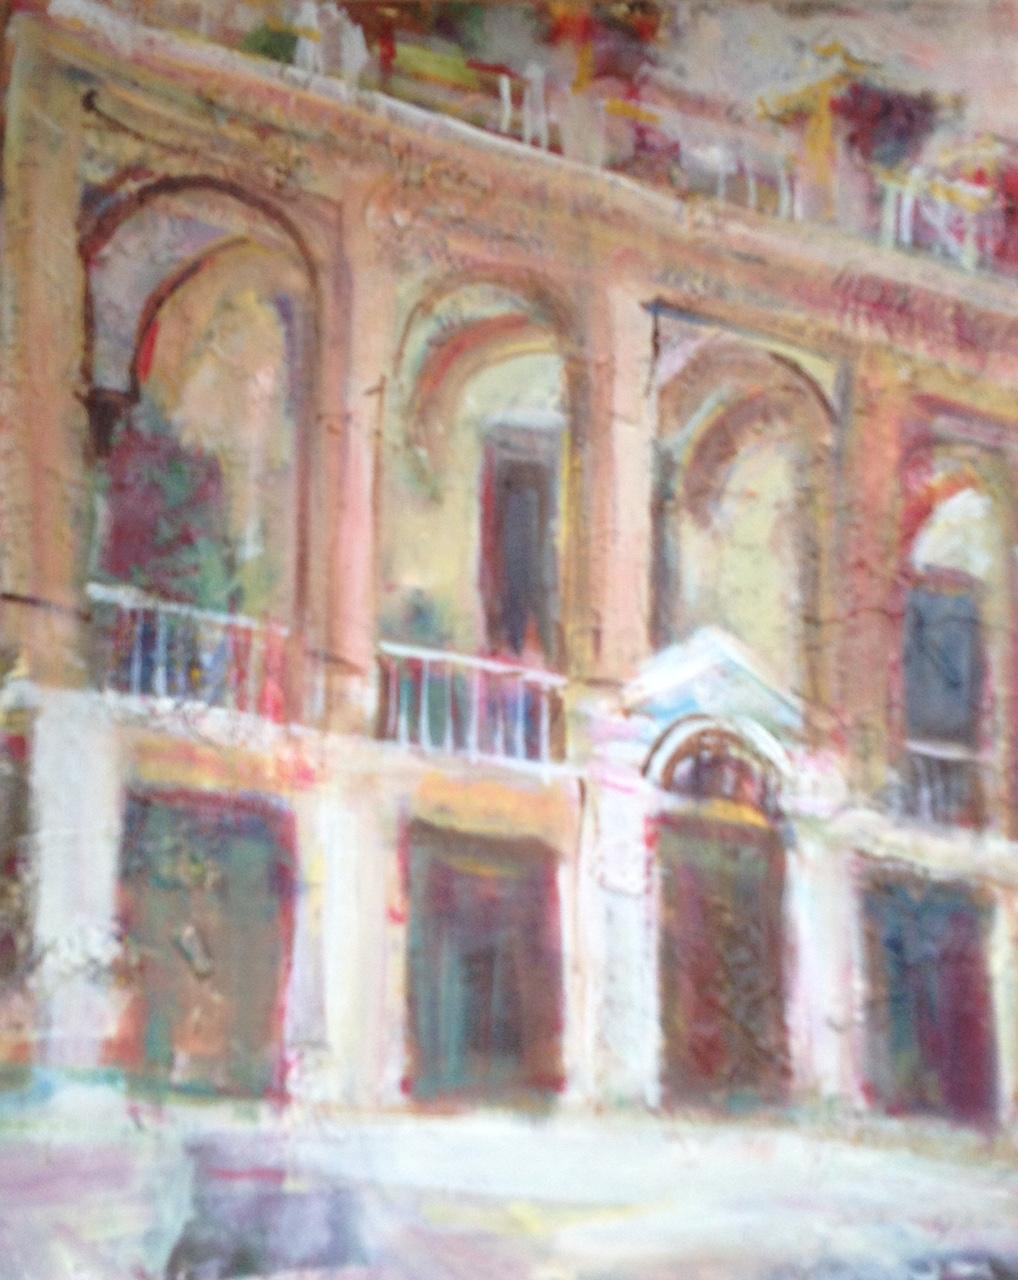 Bari-Vecchia-Piazza-Gesuiti.jpg